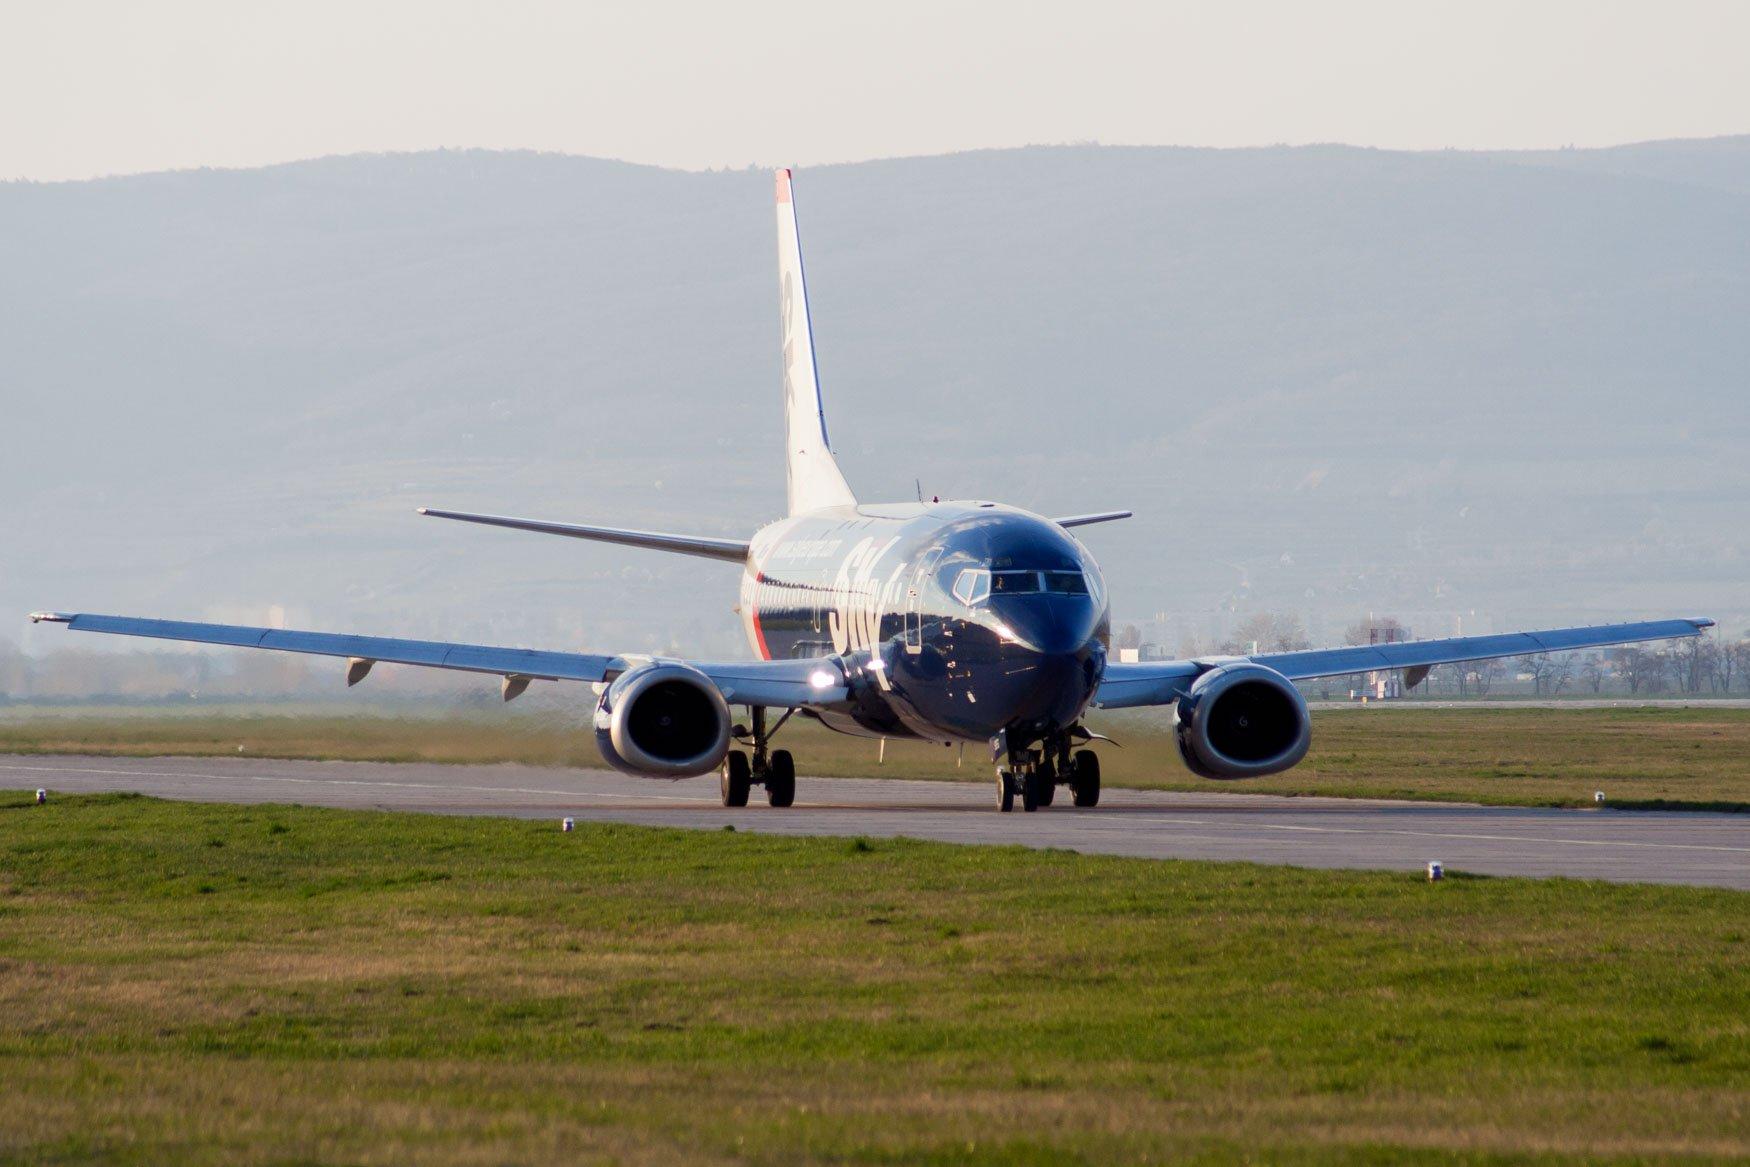 SkyEurope Airlines 737-500 at Bratislava